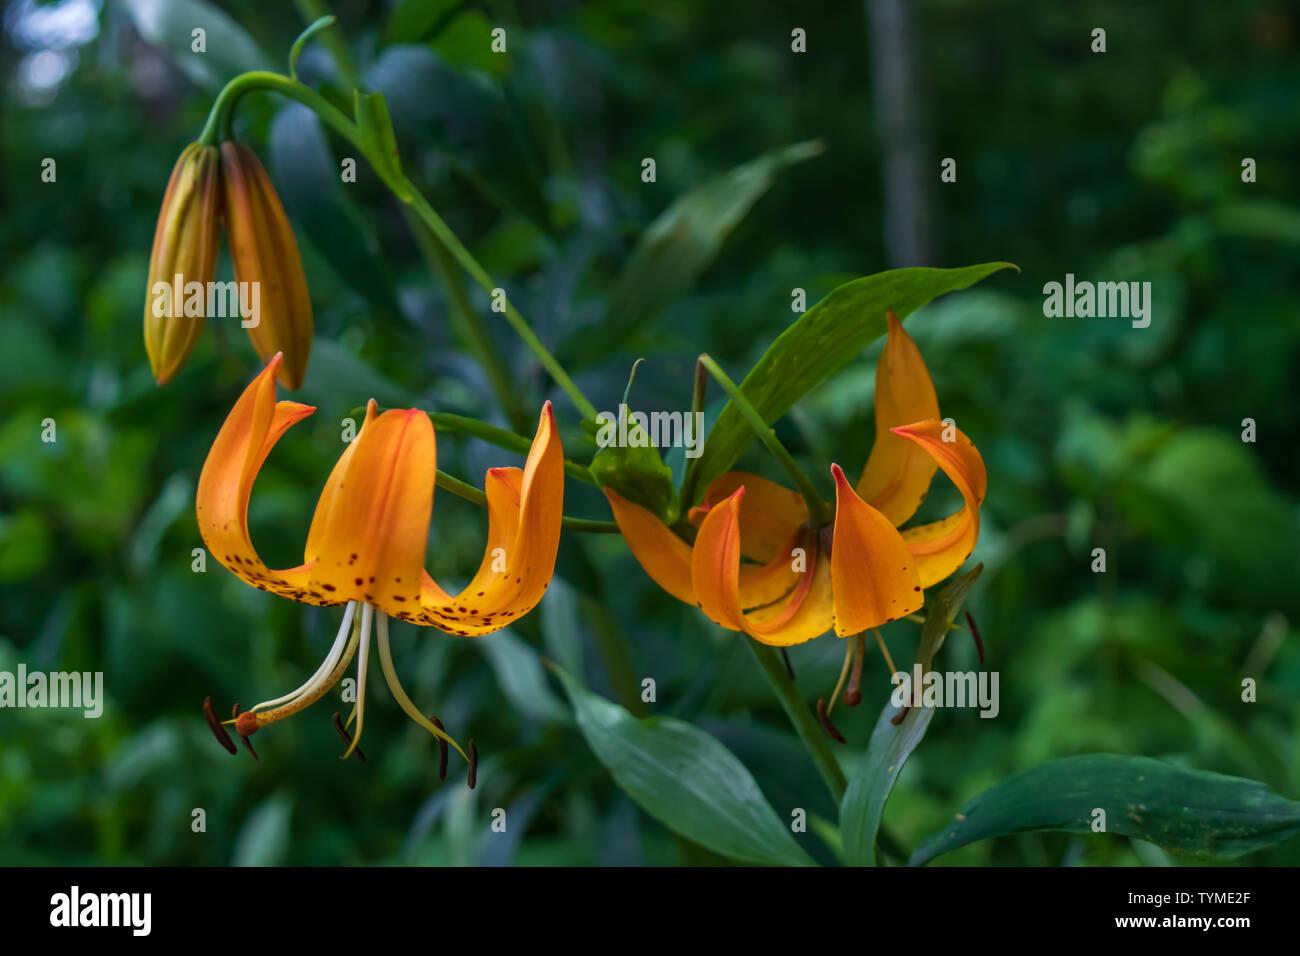 Turk's Cap Lily close-up - Stock Image